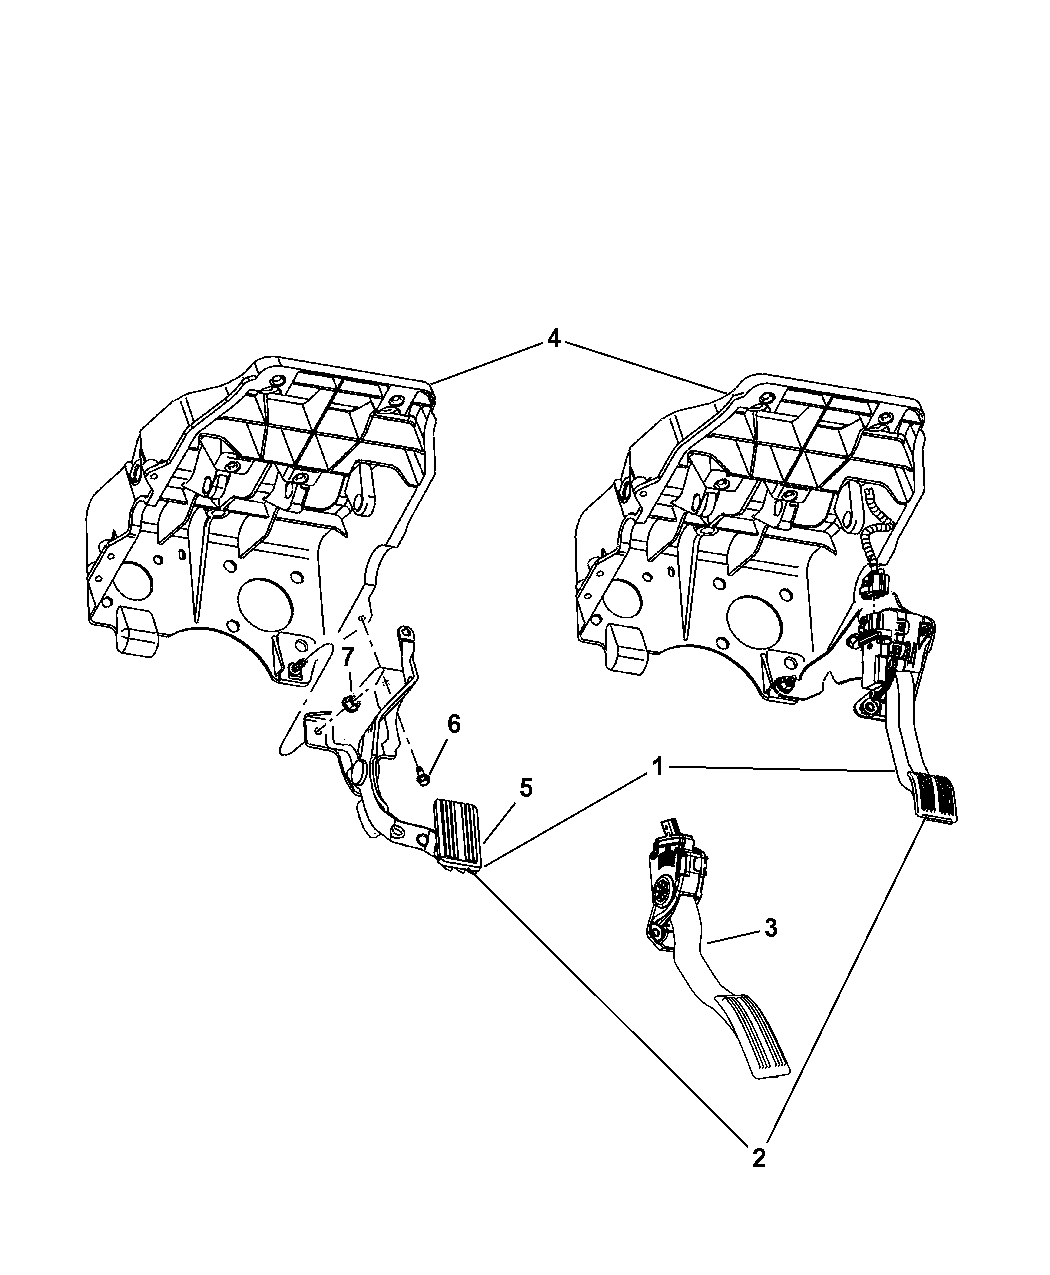 2007 dodge ram 1500 brake pedal of fuel mopar parts giant